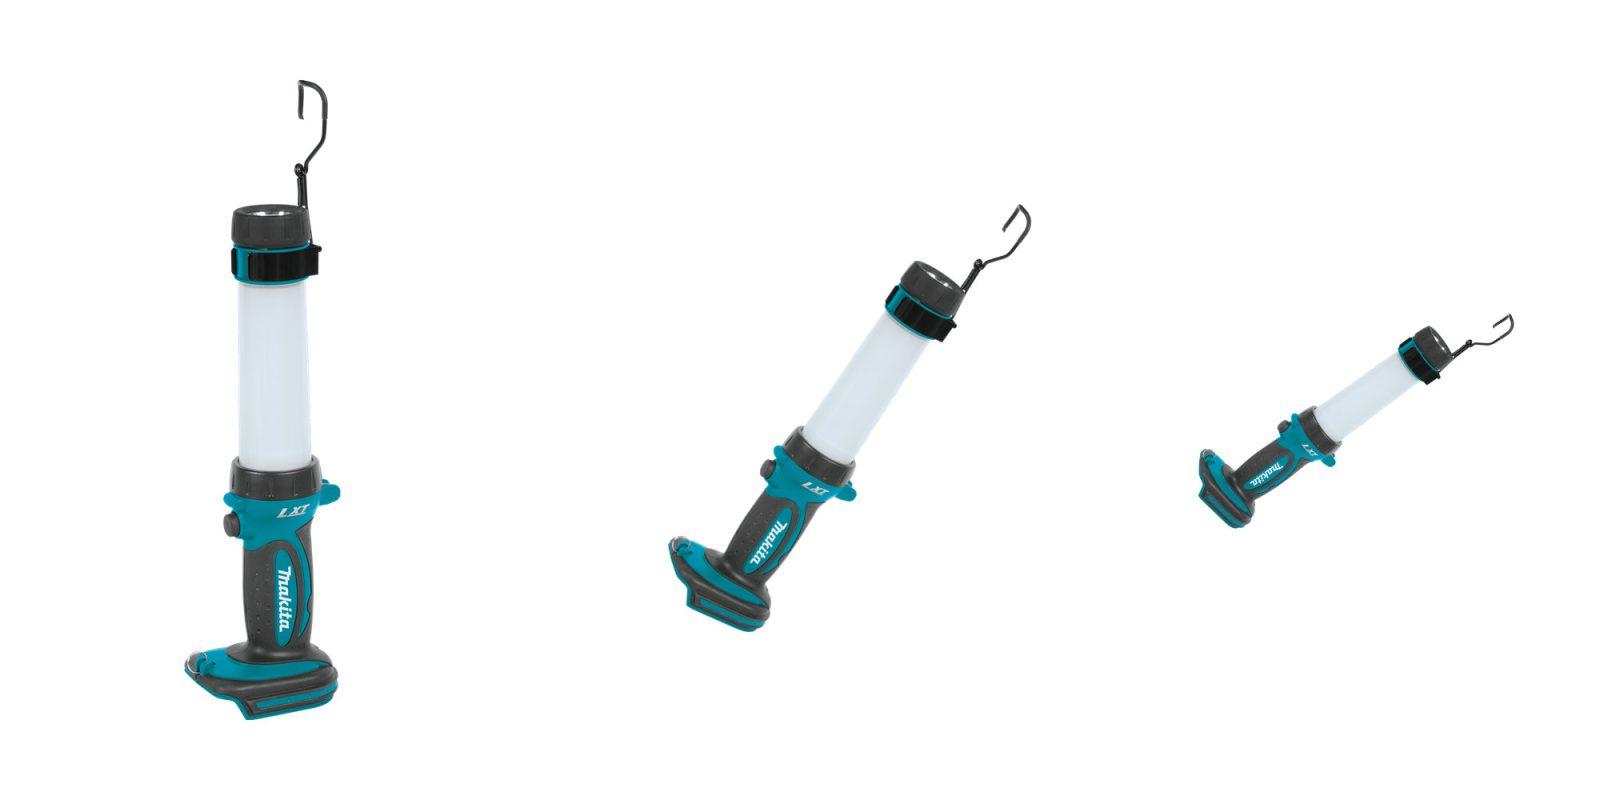 Expand your Makita tool set with a 360º LED Lantern/Flashlight: $37 (Reg. $55)